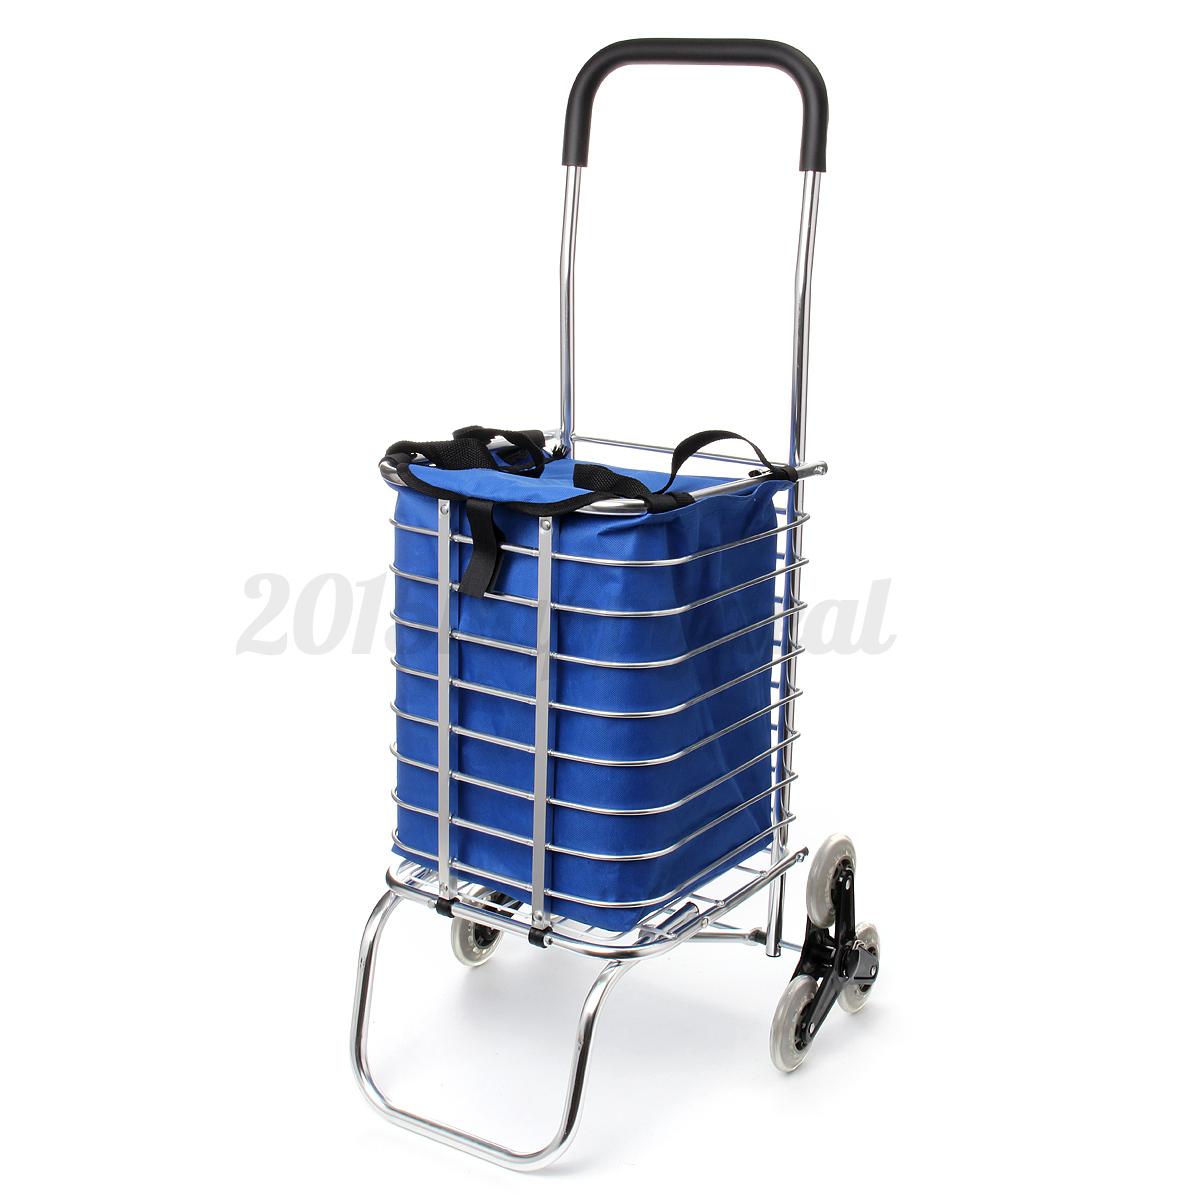 6 wheels folding foldable portable stair shopping cart